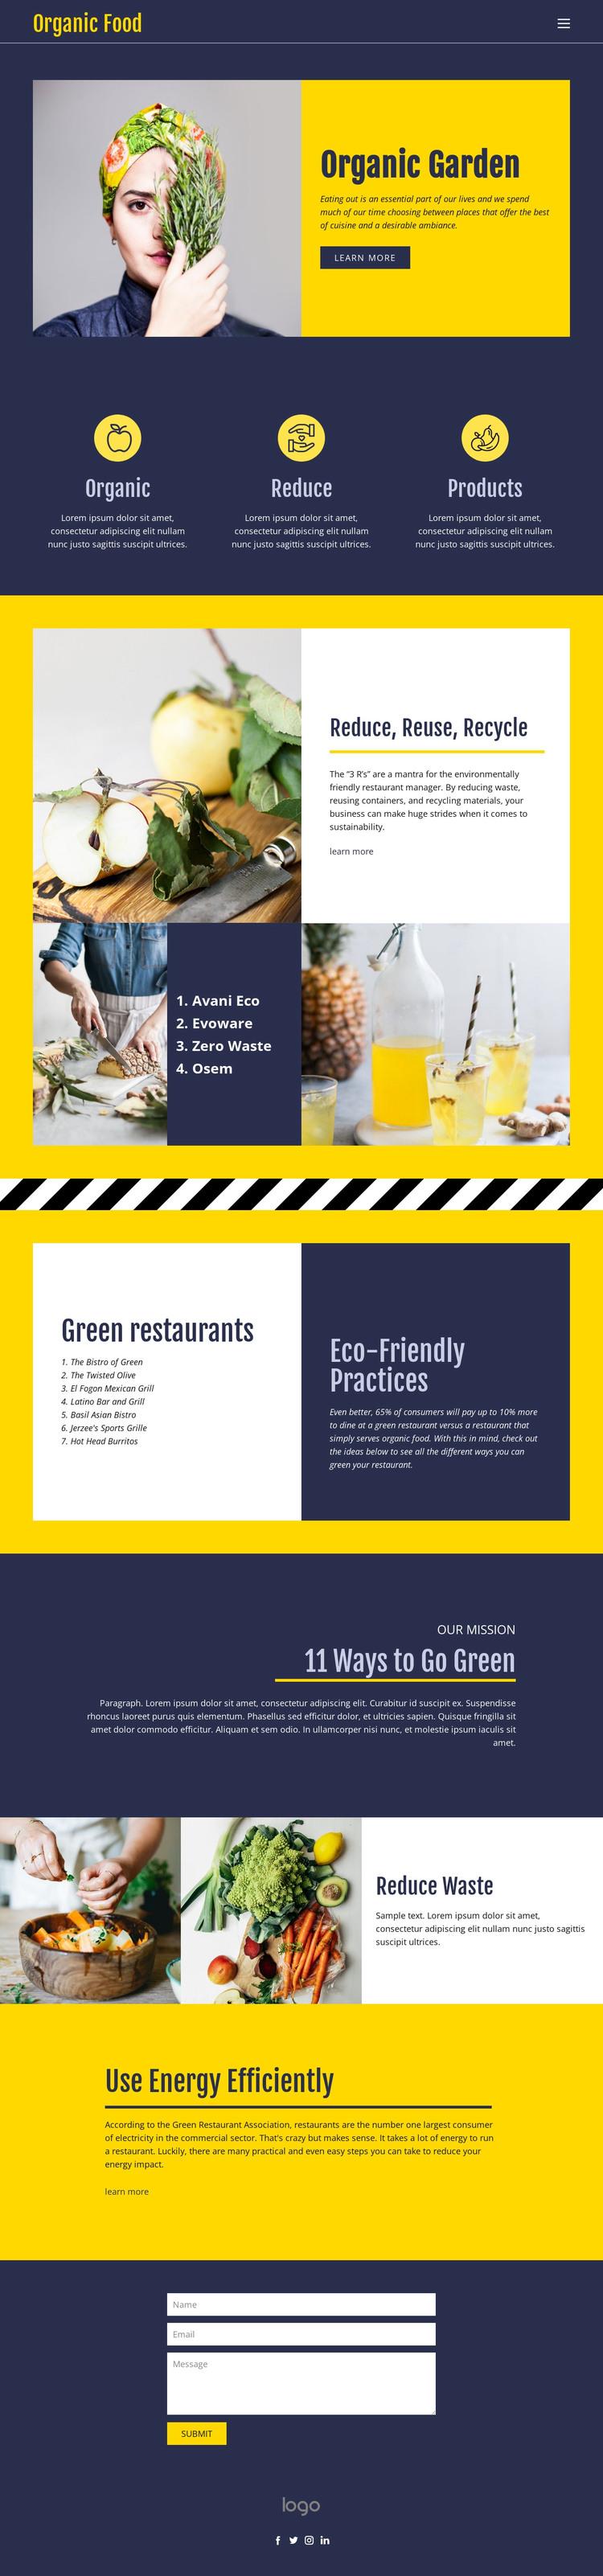 Eating essentials for food Web Design